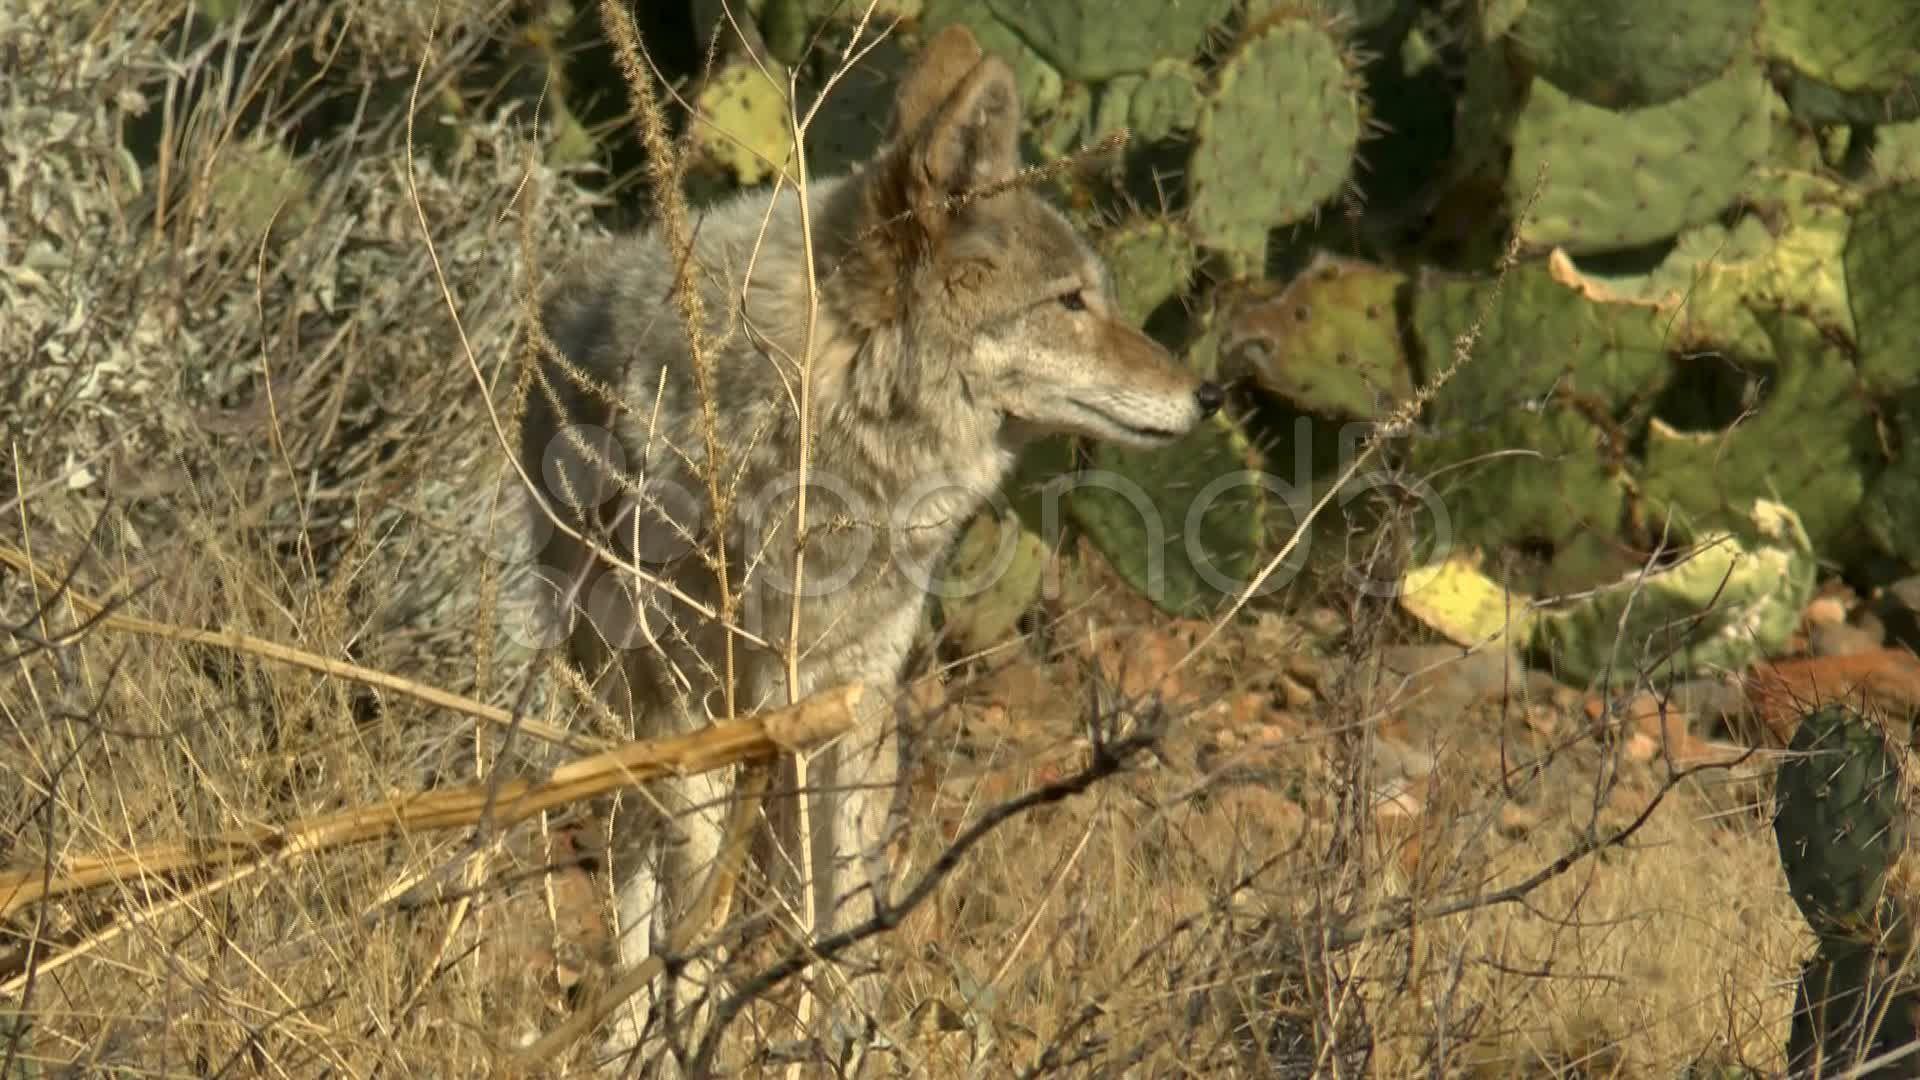 Coyote Arizona Landscape Stock Footage,ArizonaCoyote